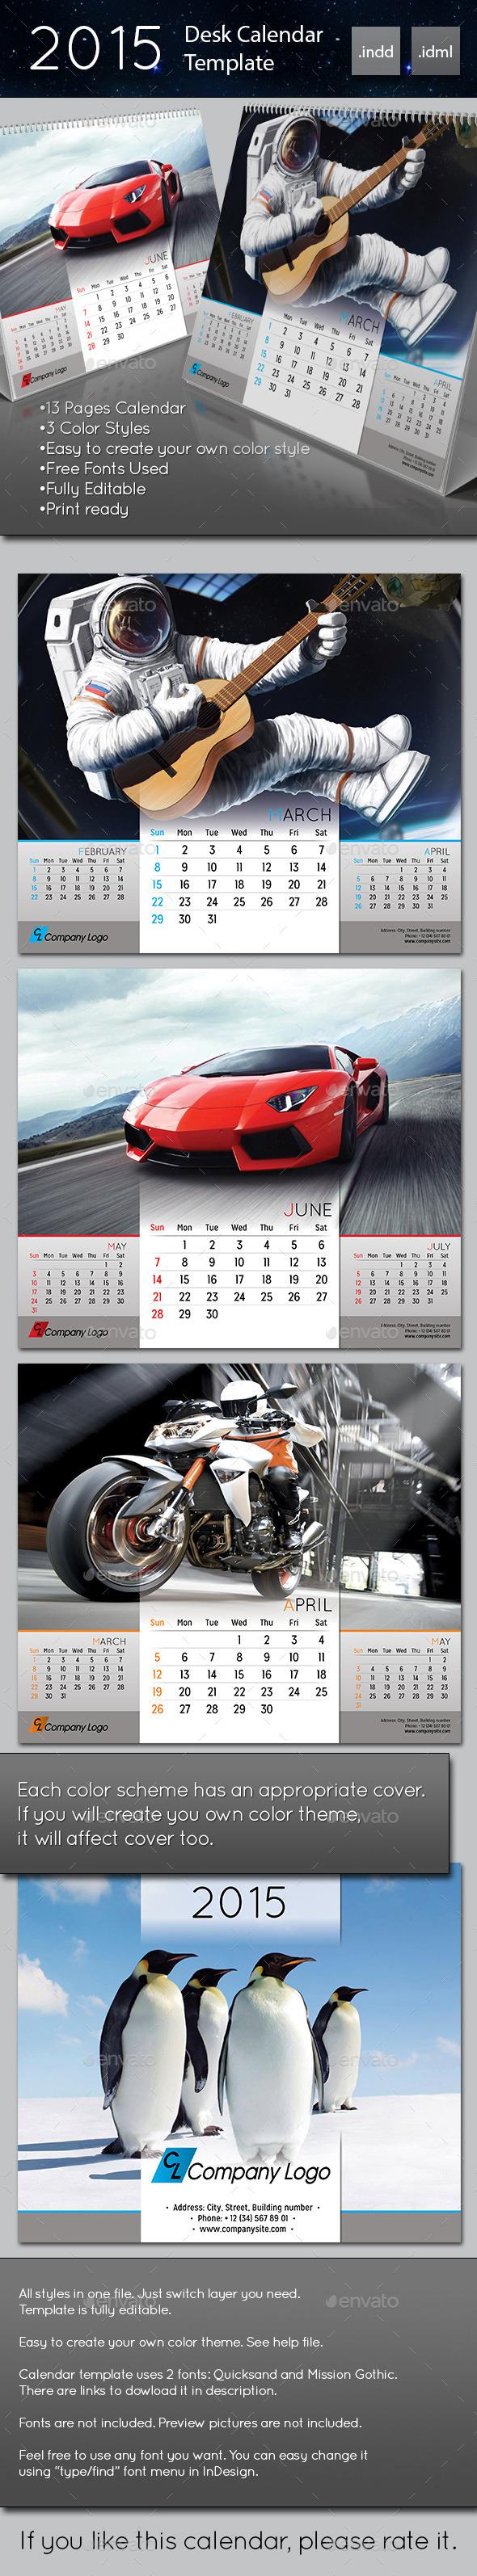 GraphicRiver 2015 Desk Calendar template 9489934